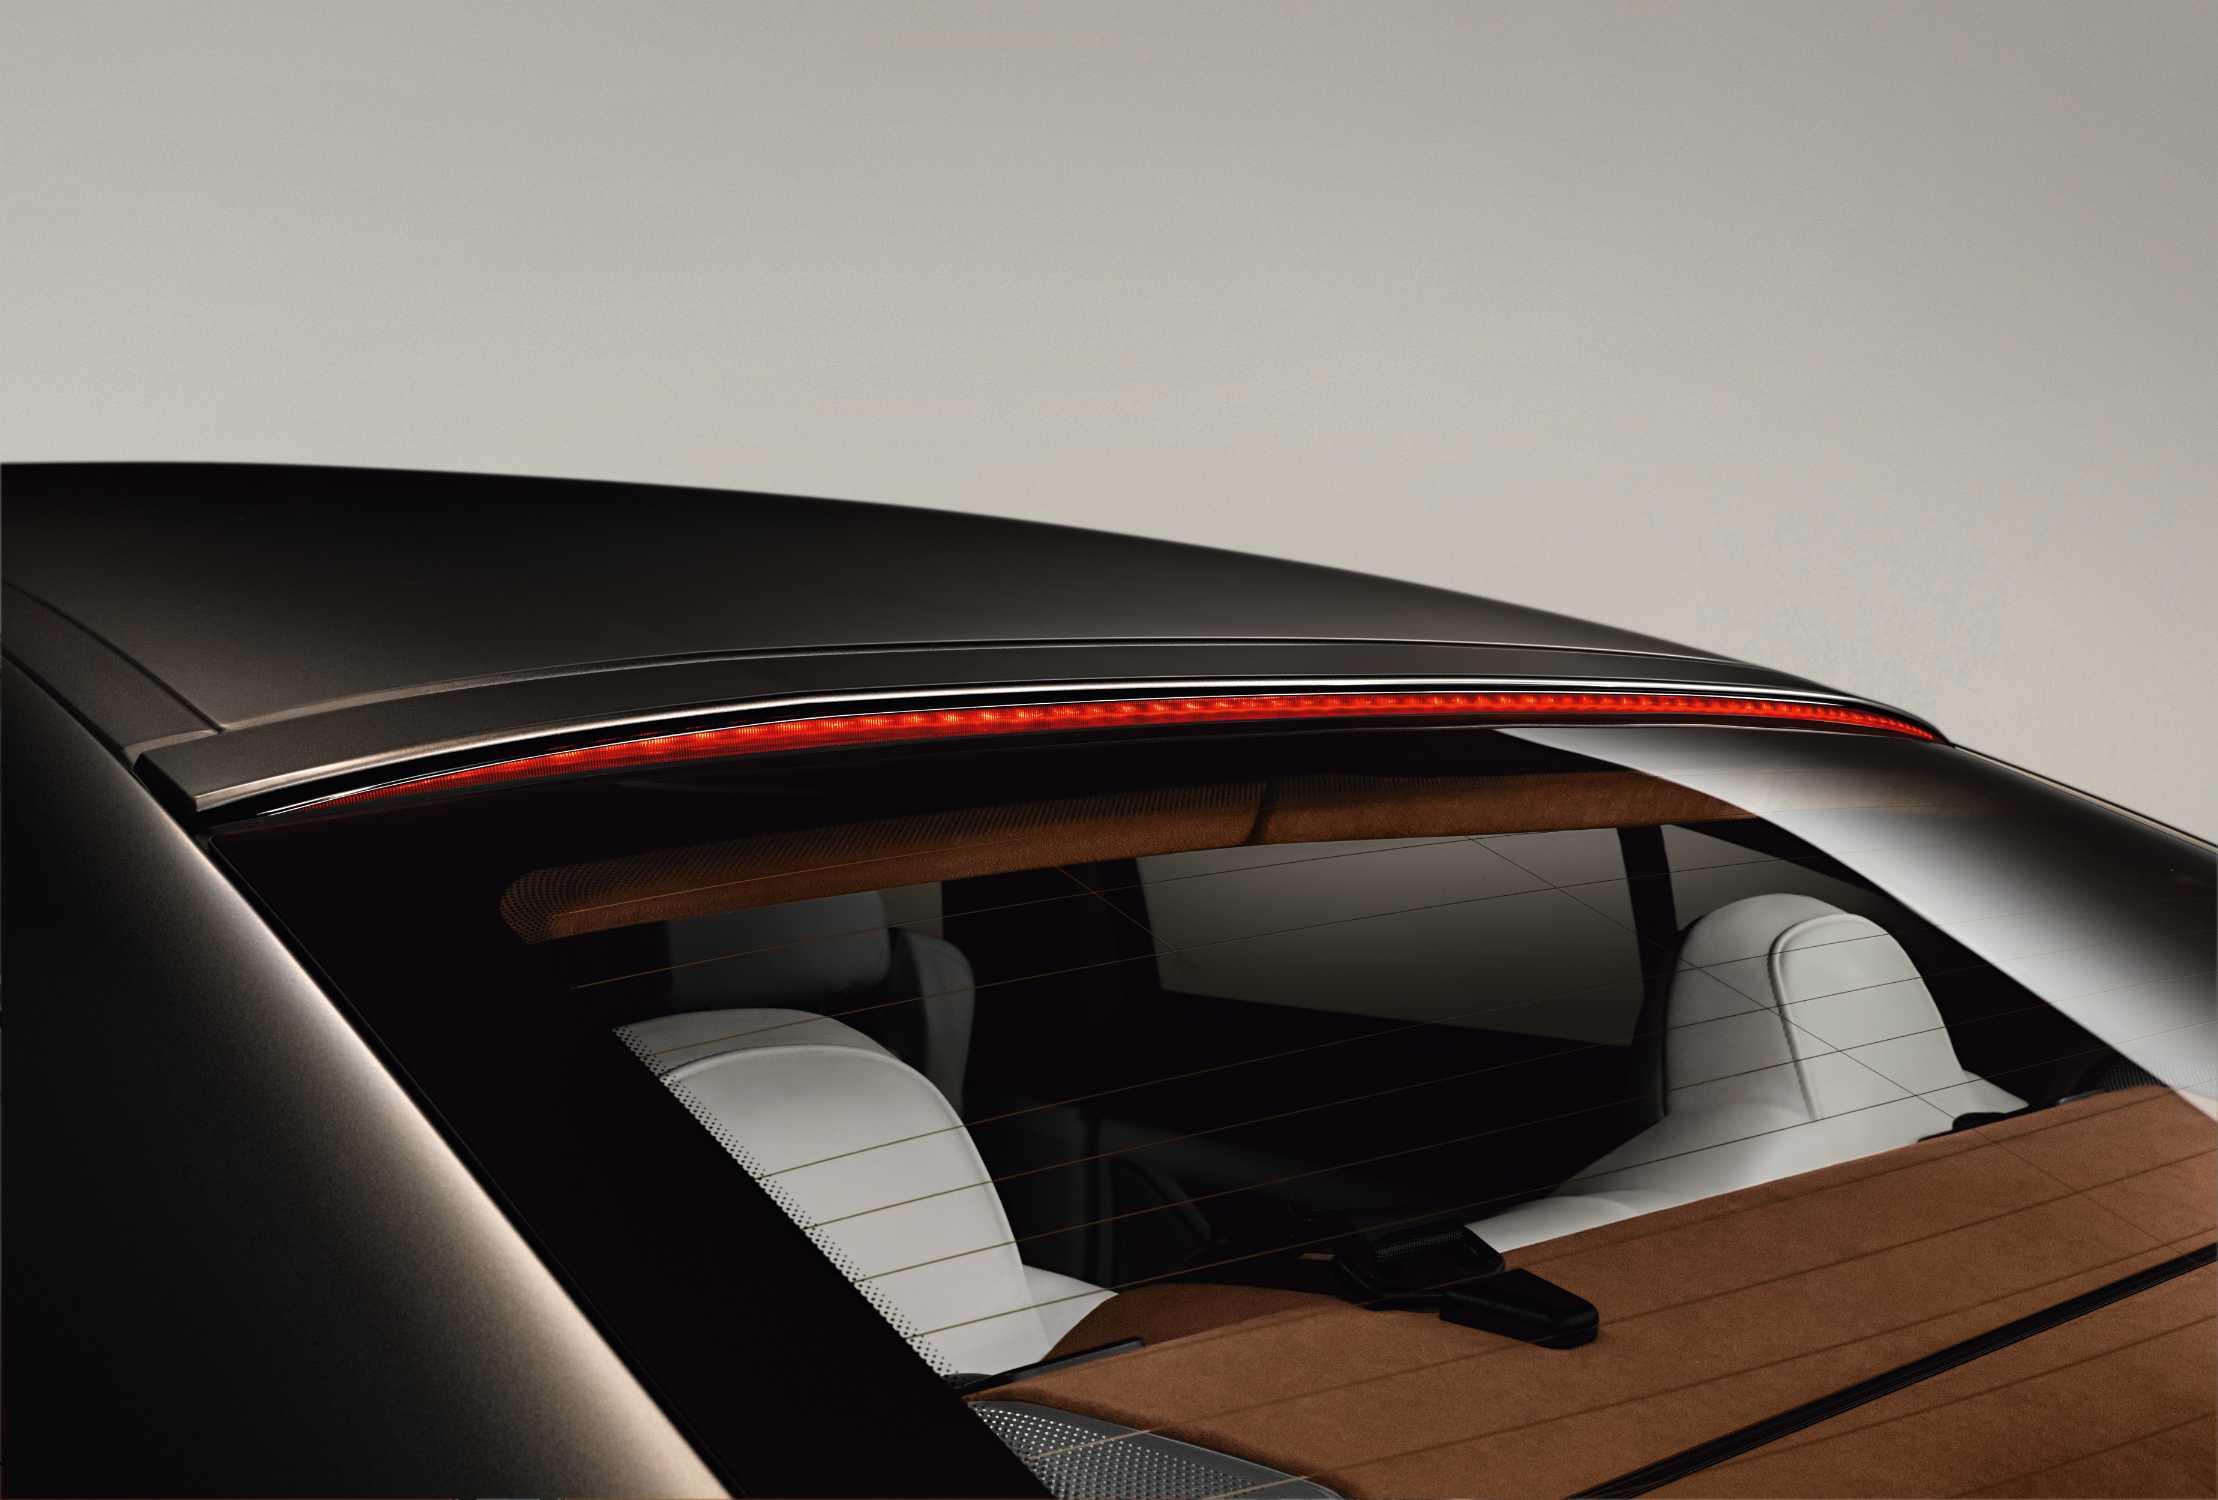 The New Bmw 650i Gran Coupe Exterior 3rd Brake Light Light On 12 2011